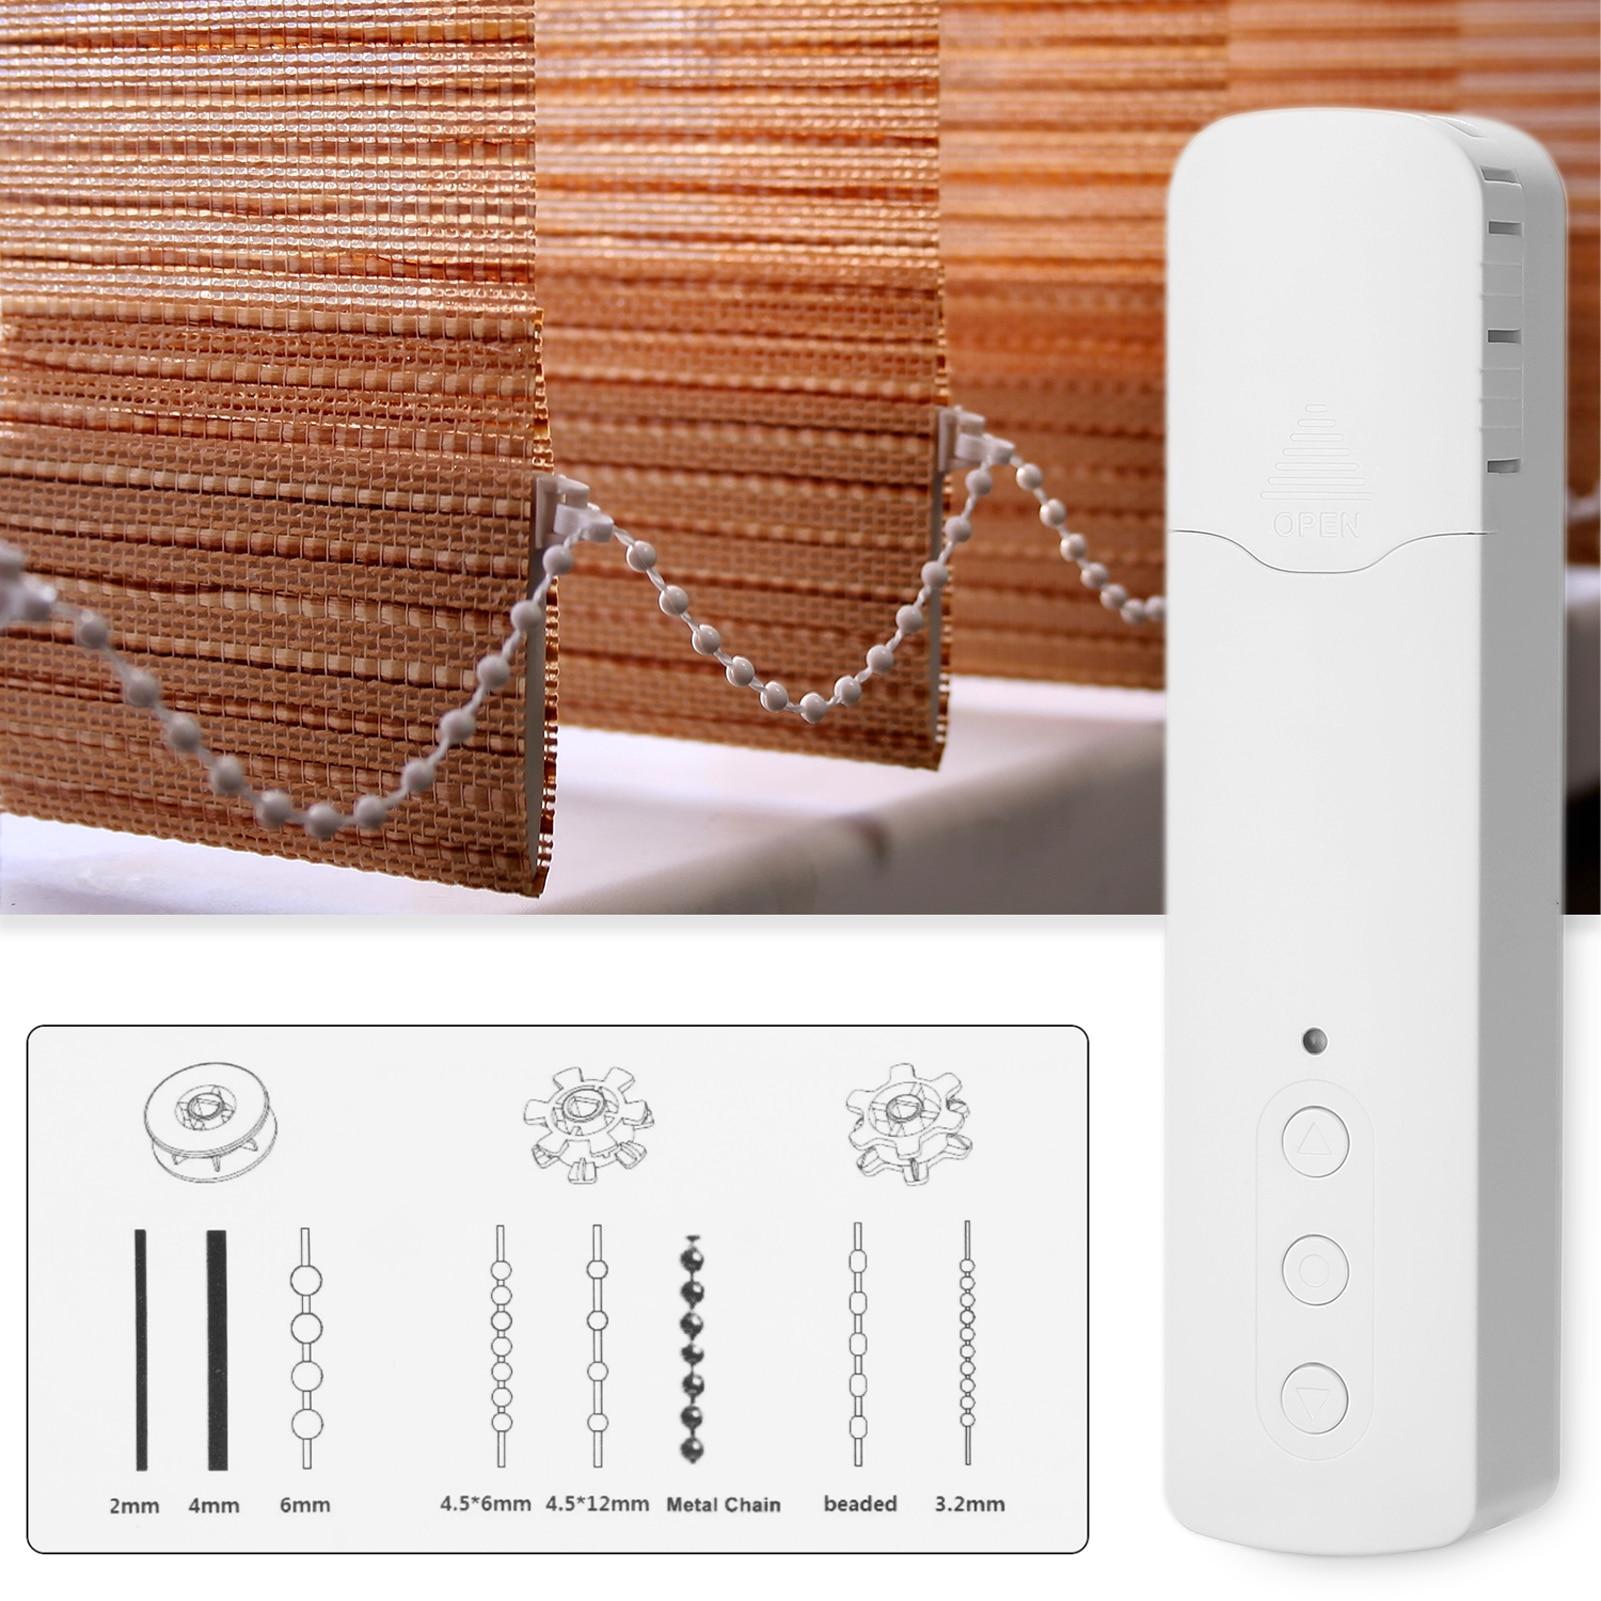 Tuya WiFi ذكي سحب حبة محرك الستائر ذكي ستارة كهربائية محرك الستائر s الهاتف المحمول APP التحكم التحكم الصوتي هادئة